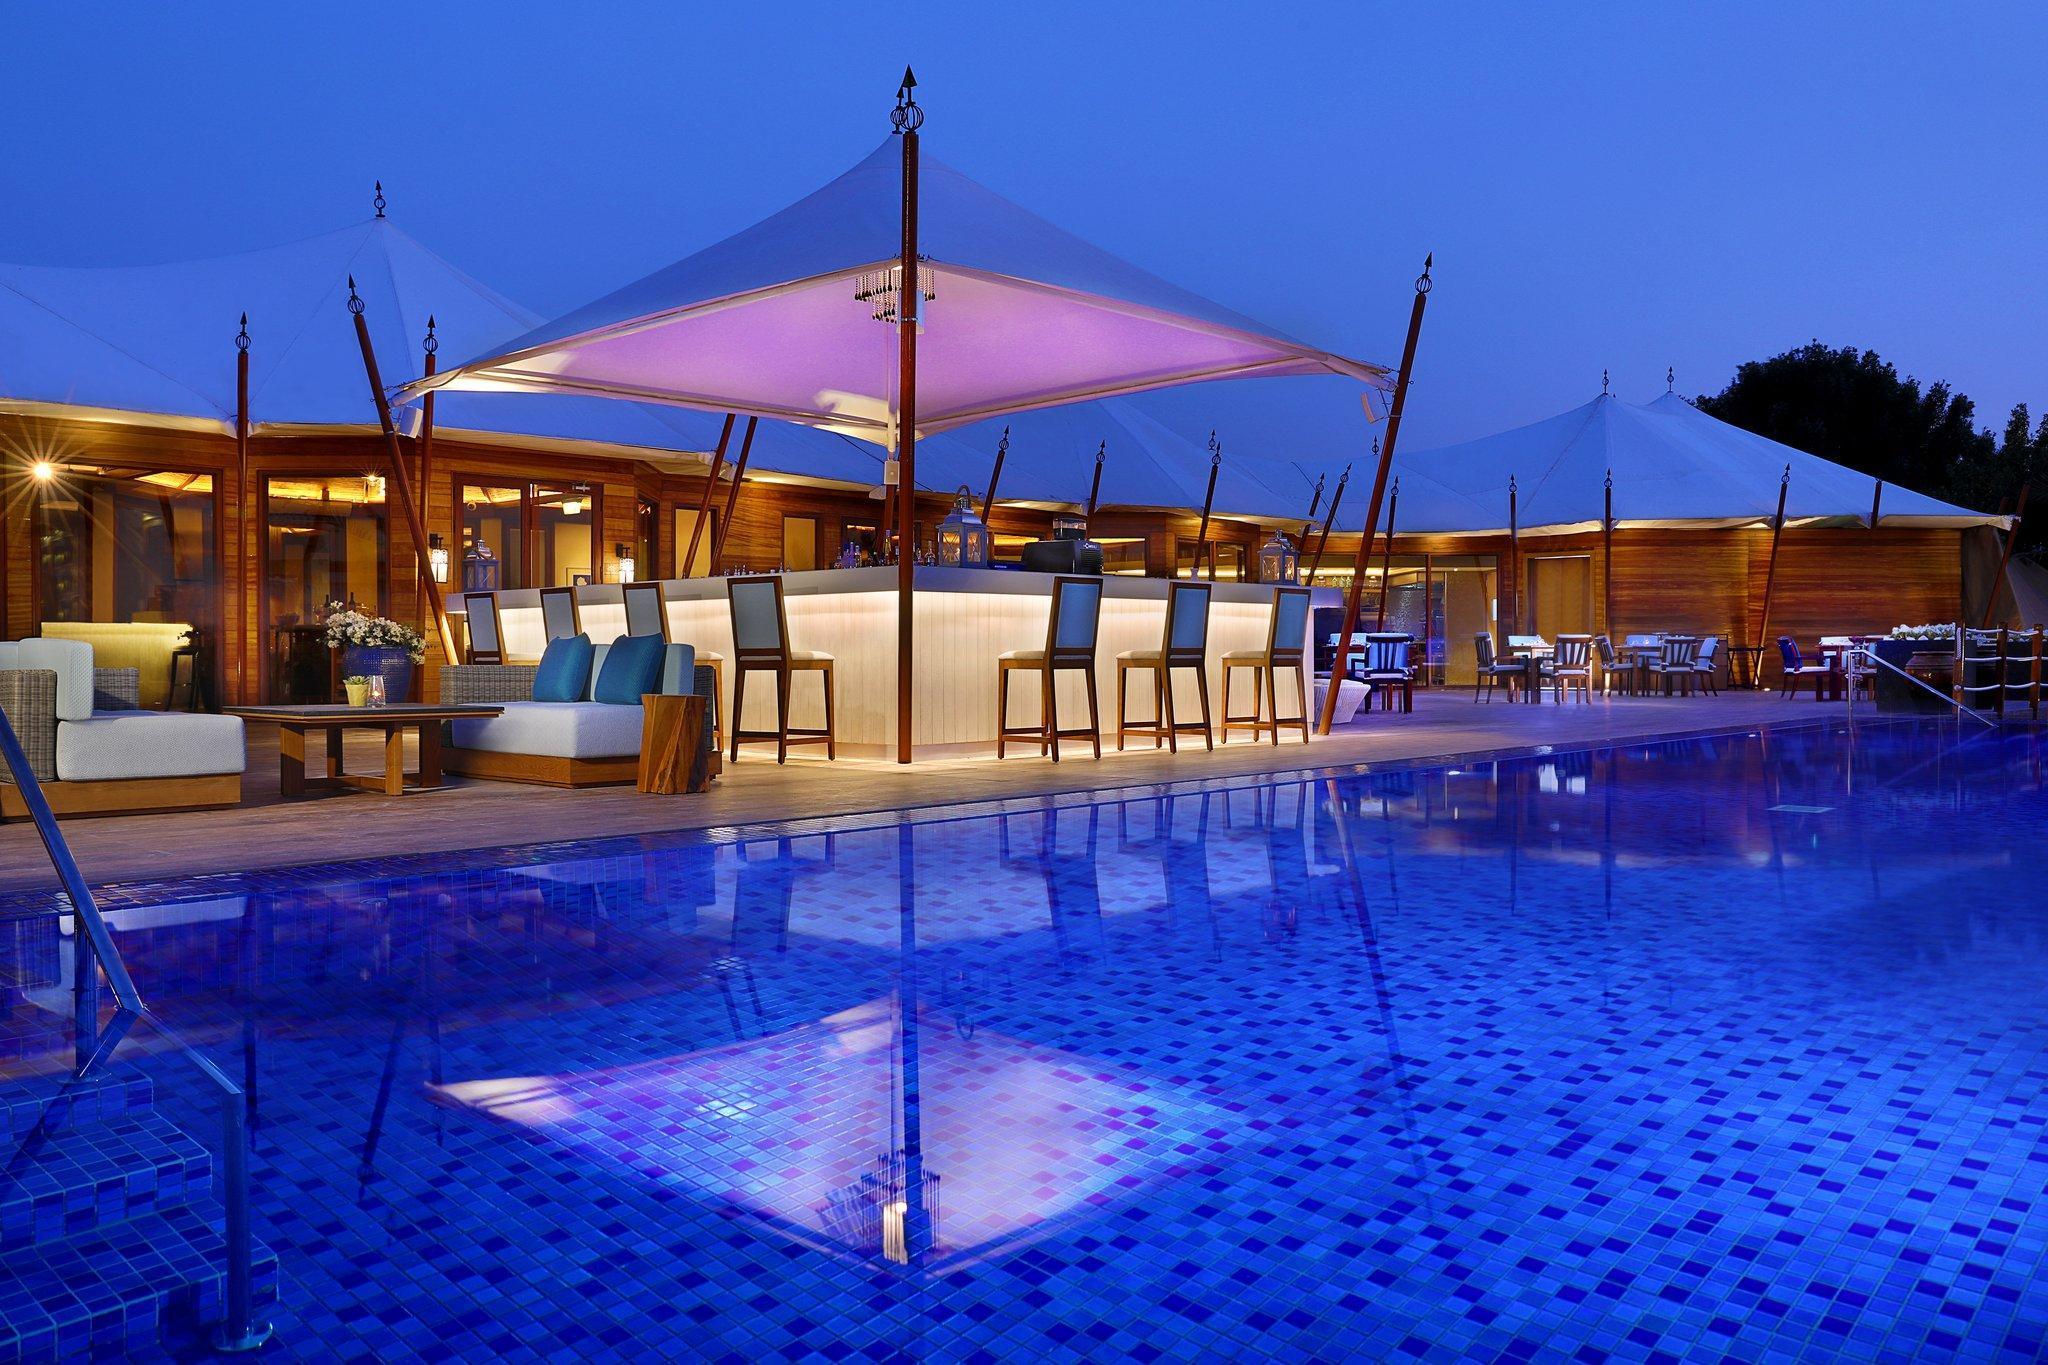 The Ritz Carlton Ras Al Khaimah